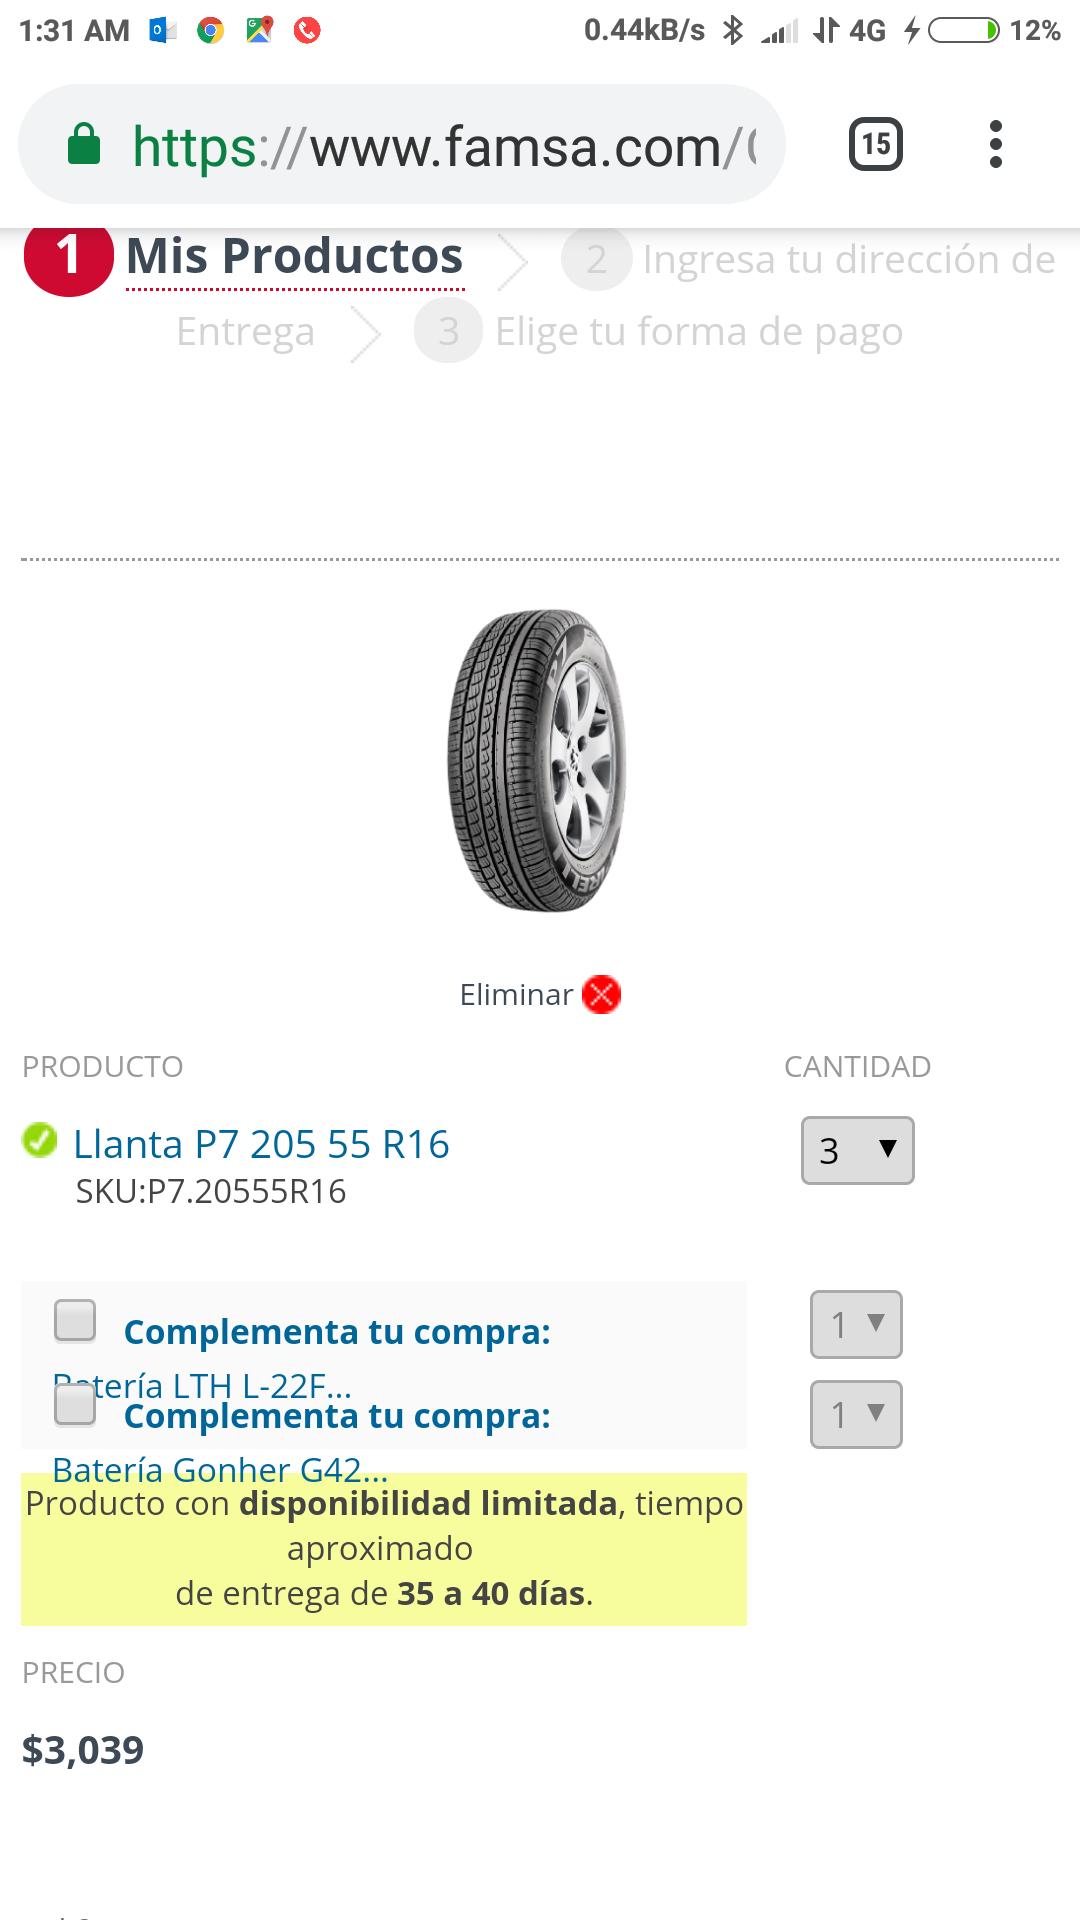 Famsa: Llantas pirrelli 205 55 R16 p7